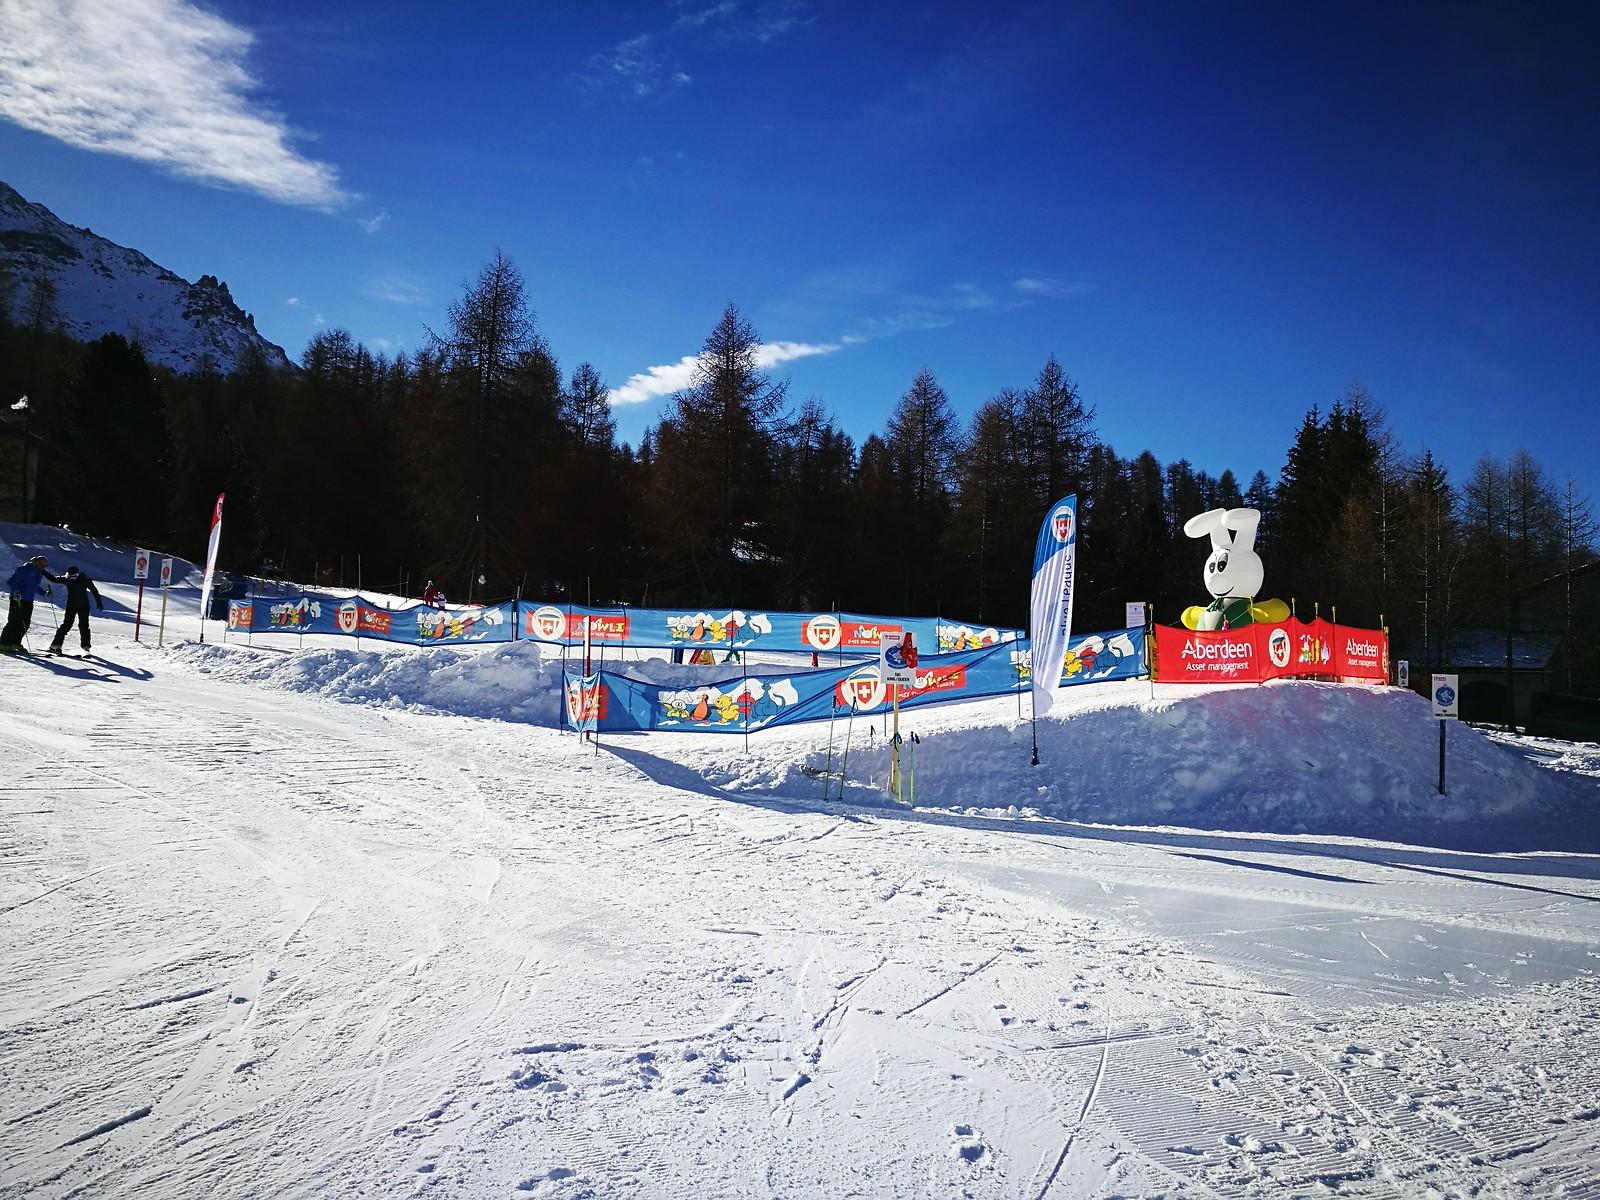 Ski school area